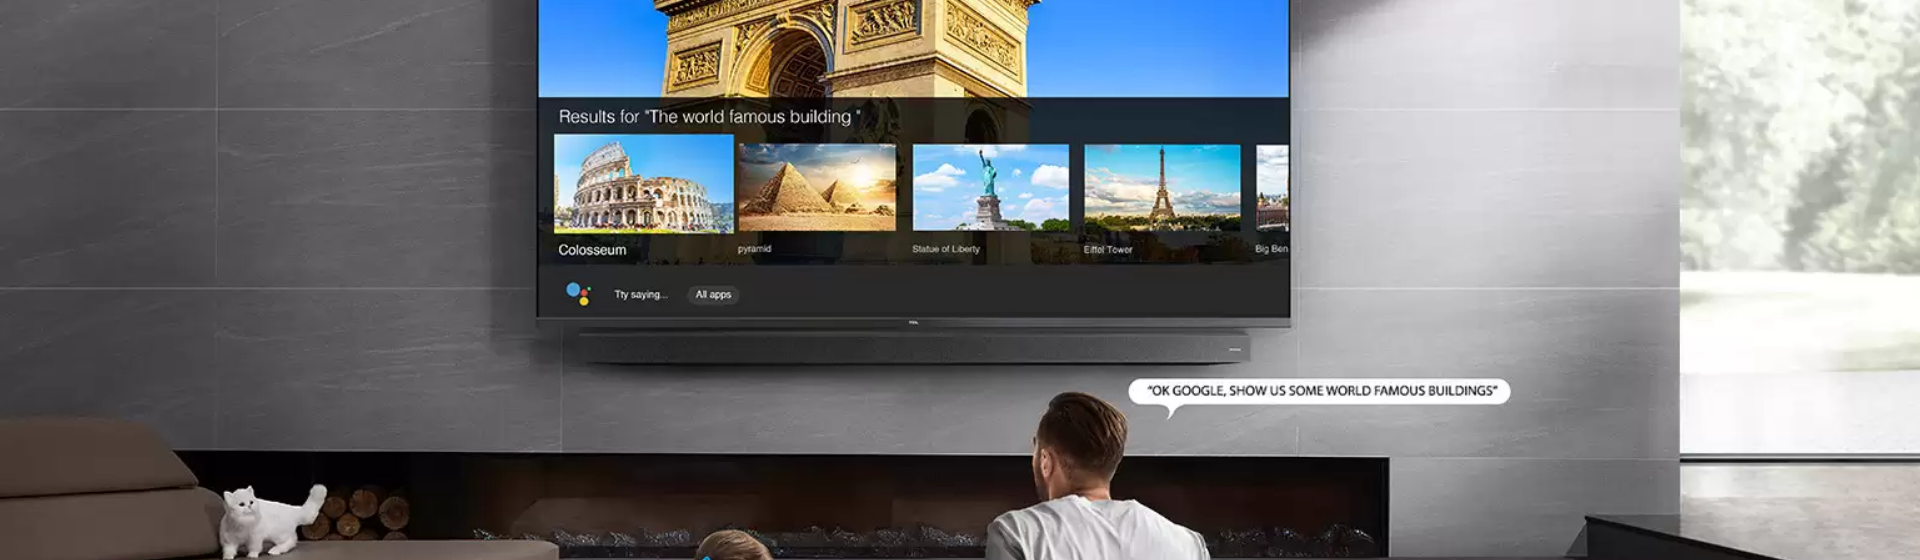 CES 2021: TCL anuncia videochamadas por Google Duo nas smart TVs